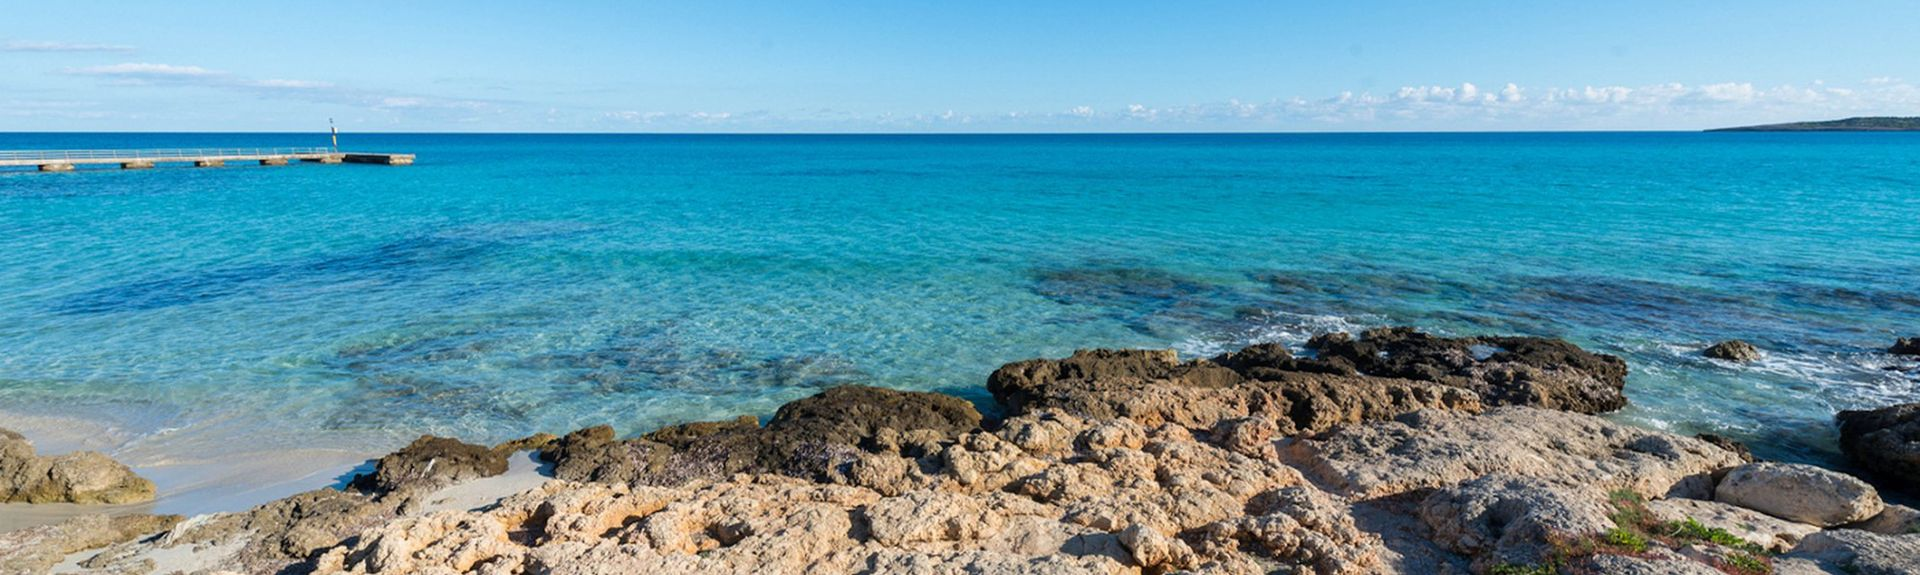 Cala Mandia, Manacor, Balearerna, Spanien